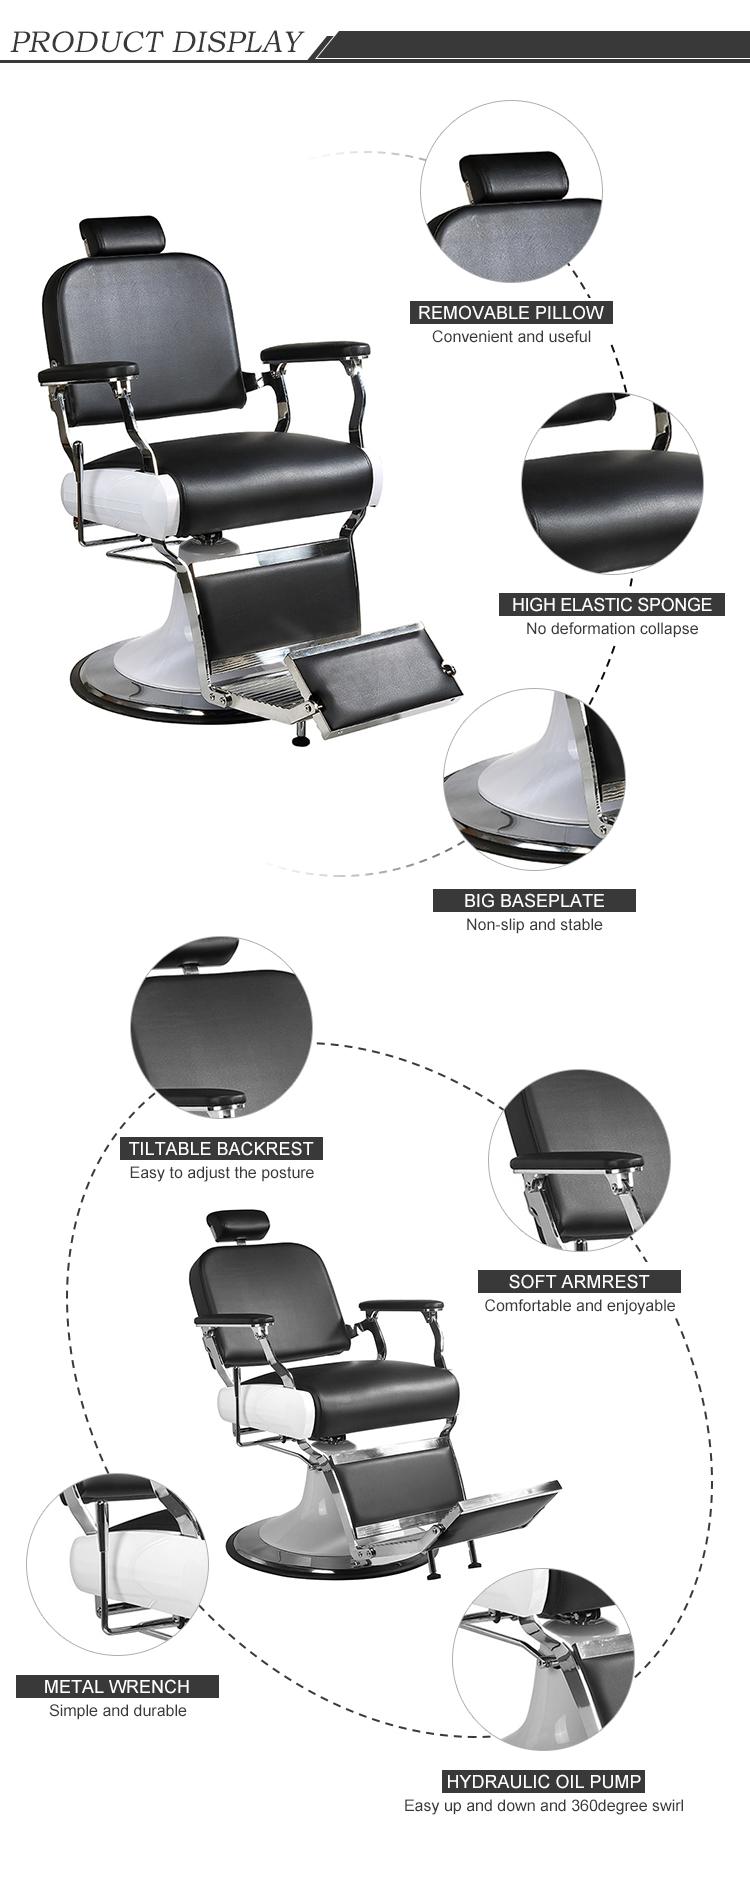 HL-31828-P3 man barber chair for salon furniture